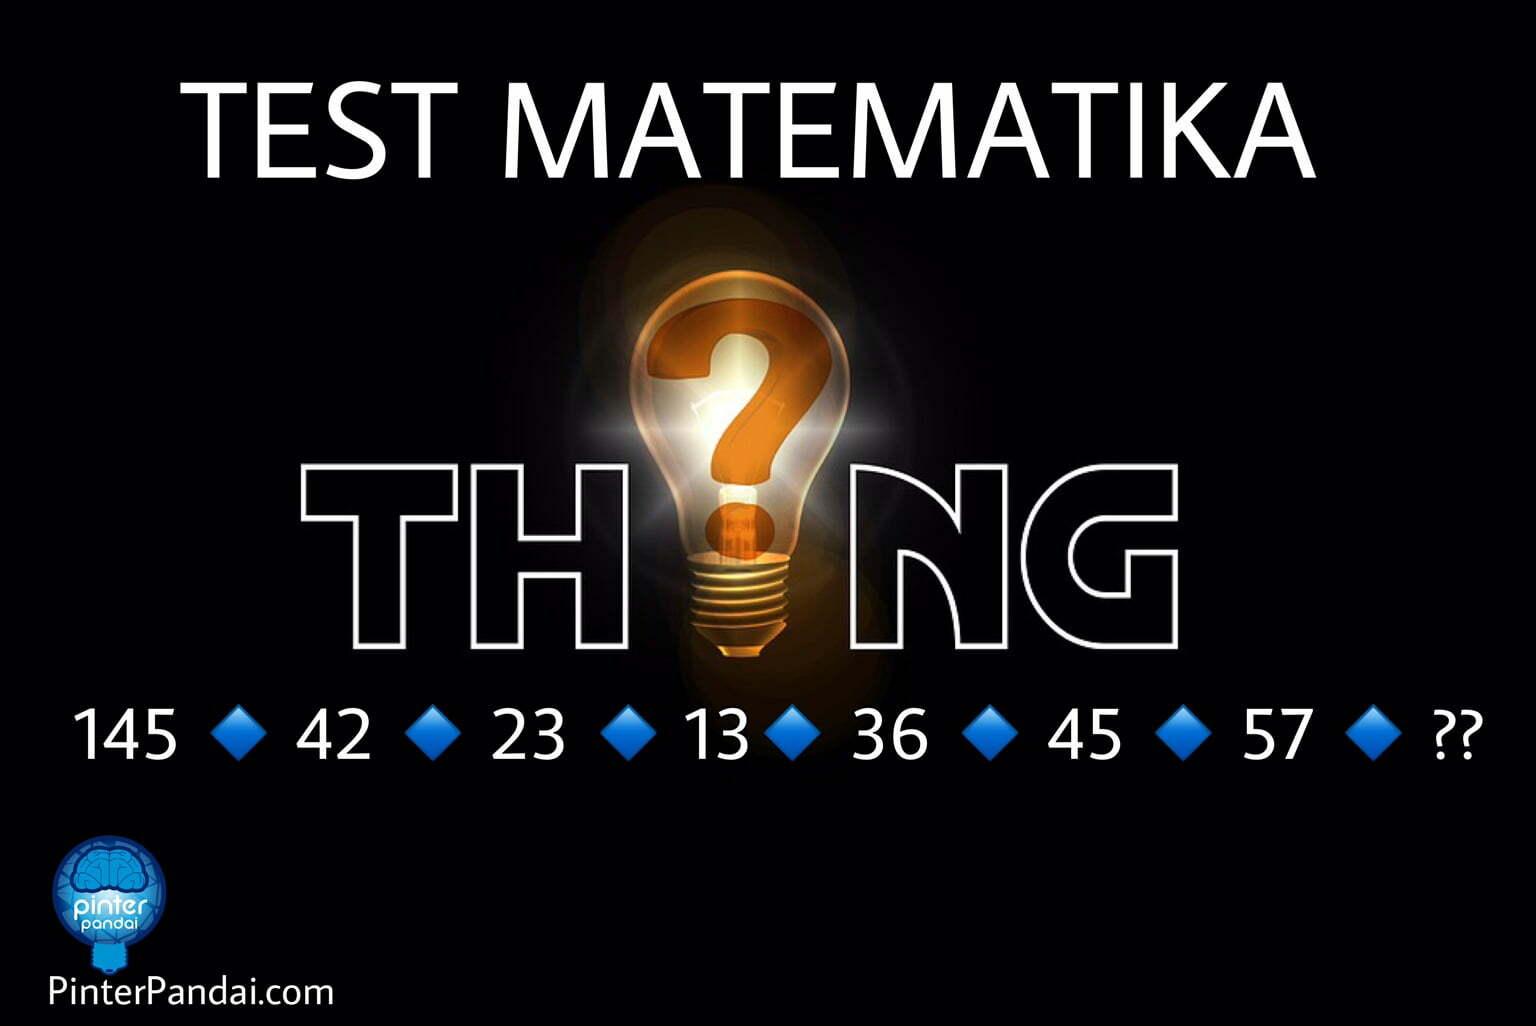 Tes Matematika Deret Angka - Bersama Cara Menghitung Akar Kuadrat